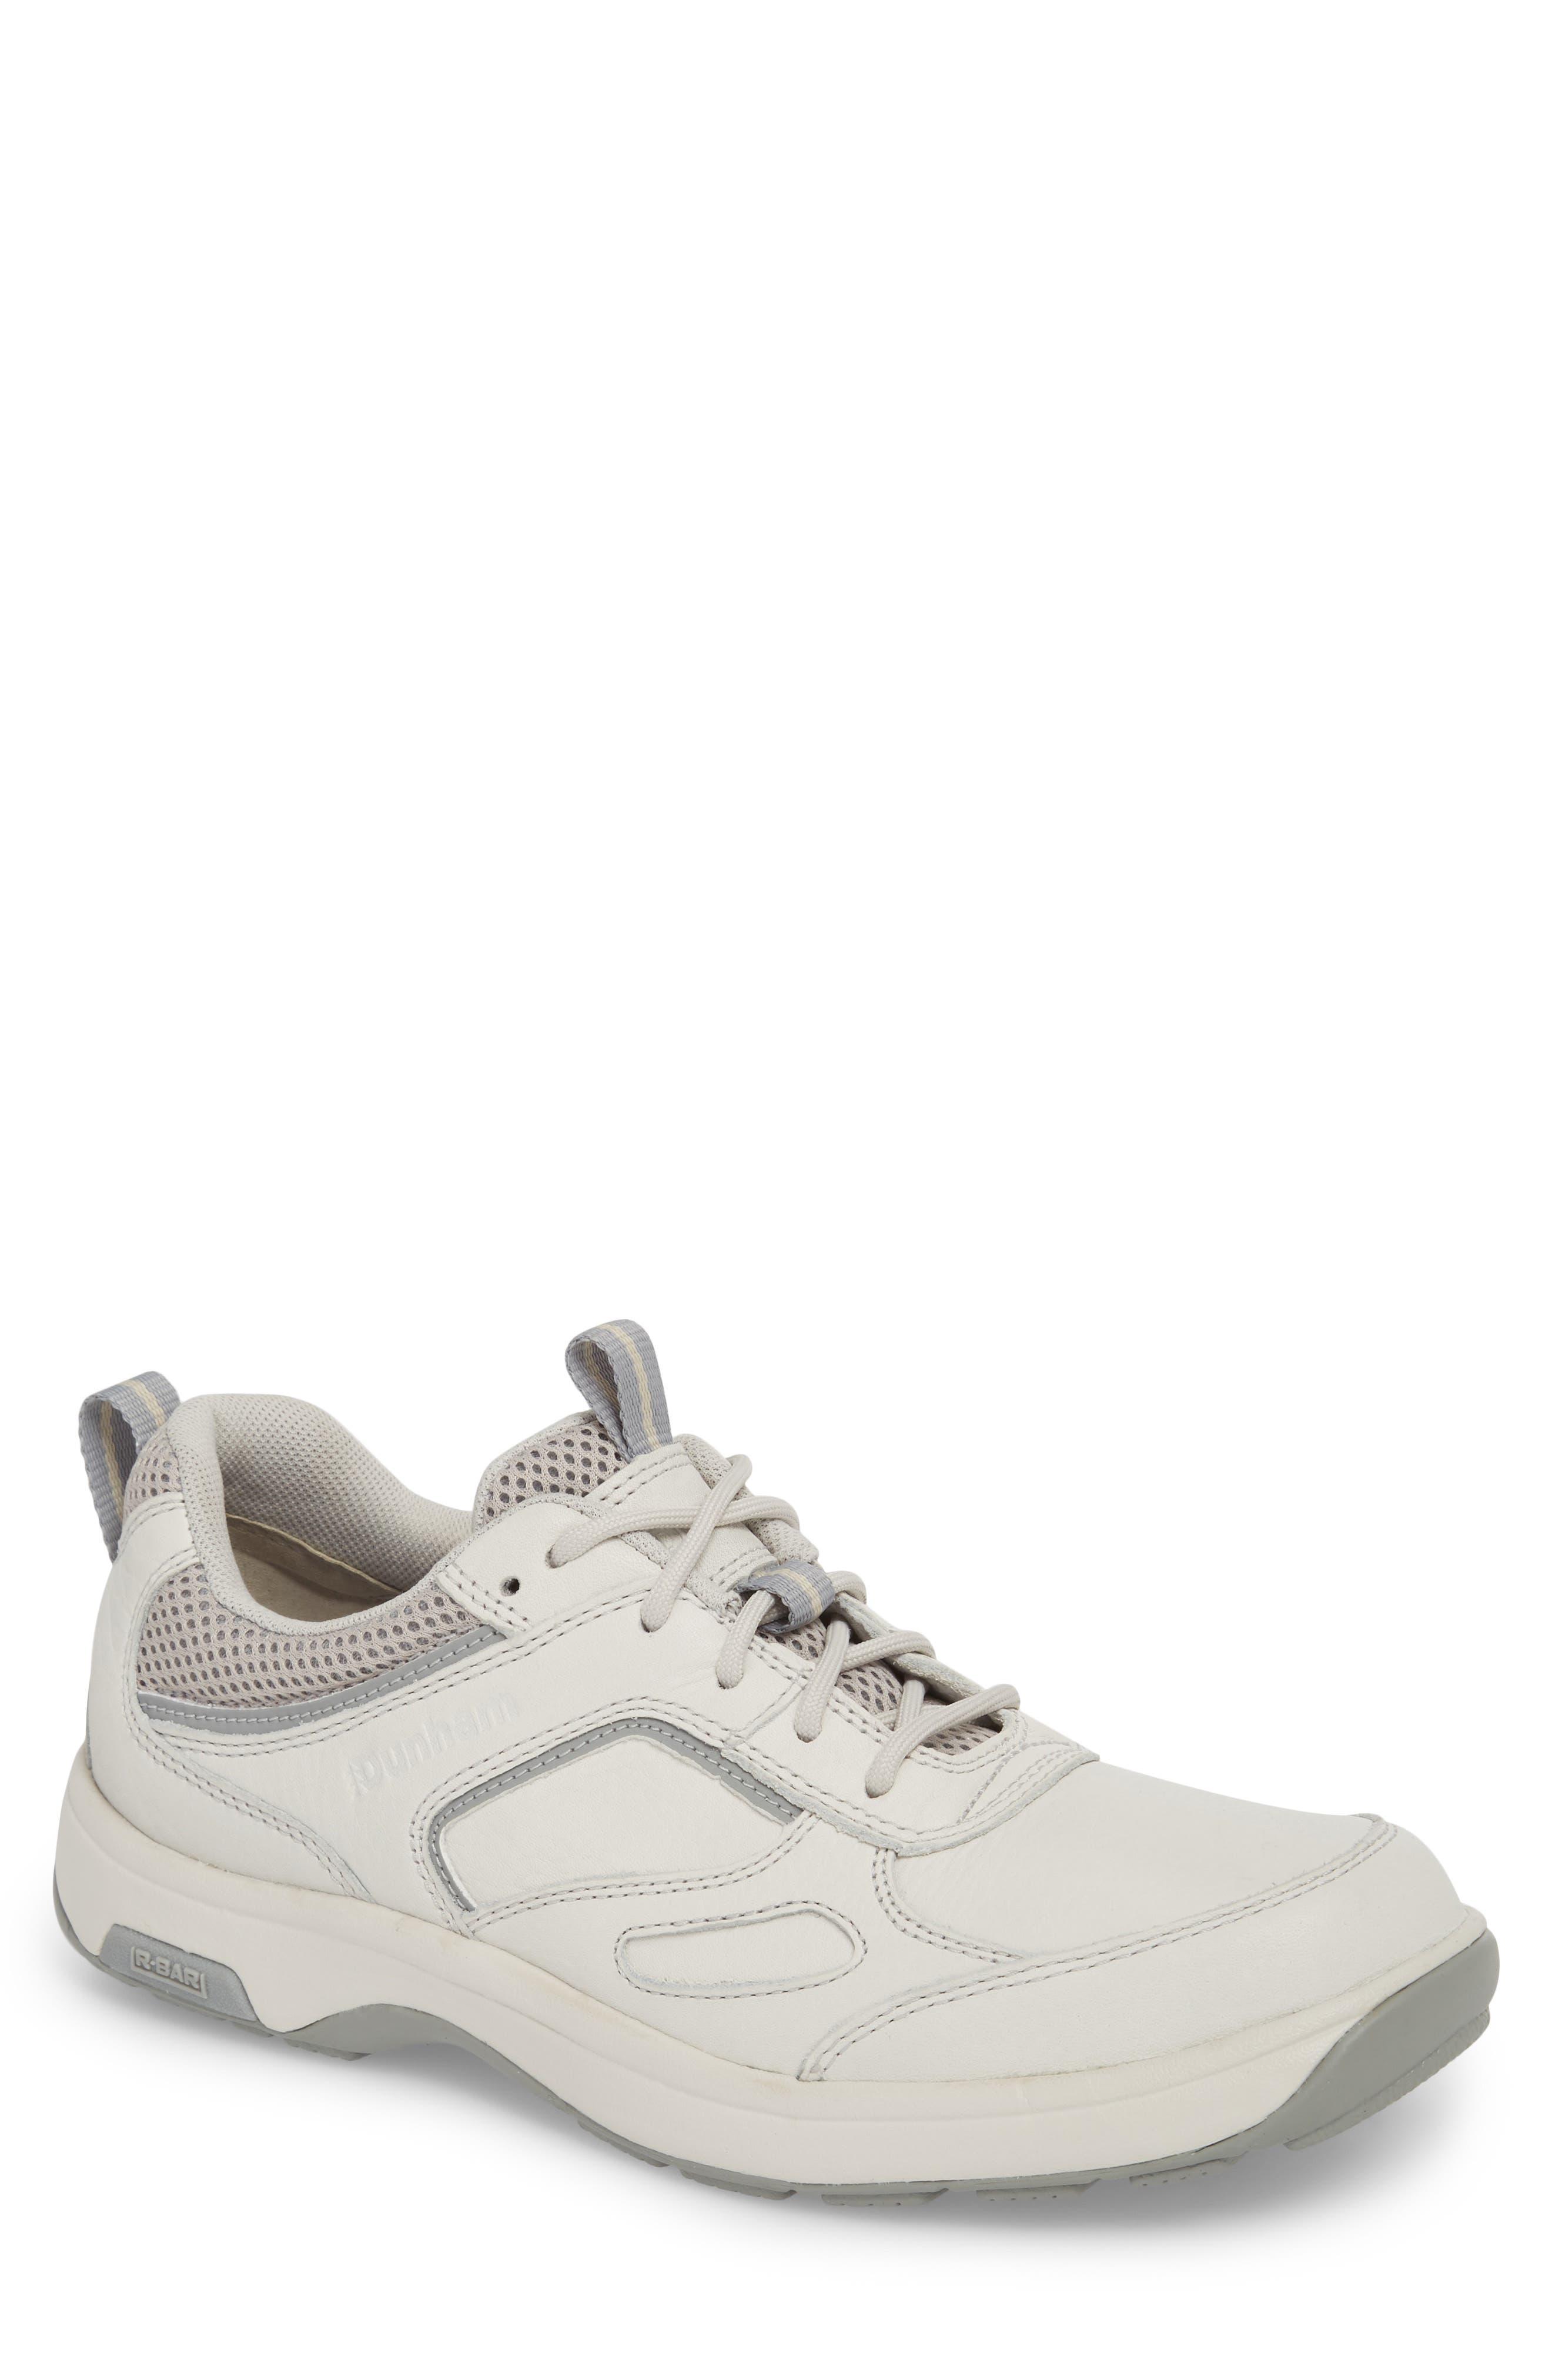 8000 Uball Sneaker,                             Main thumbnail 1, color,                             Off White Leather